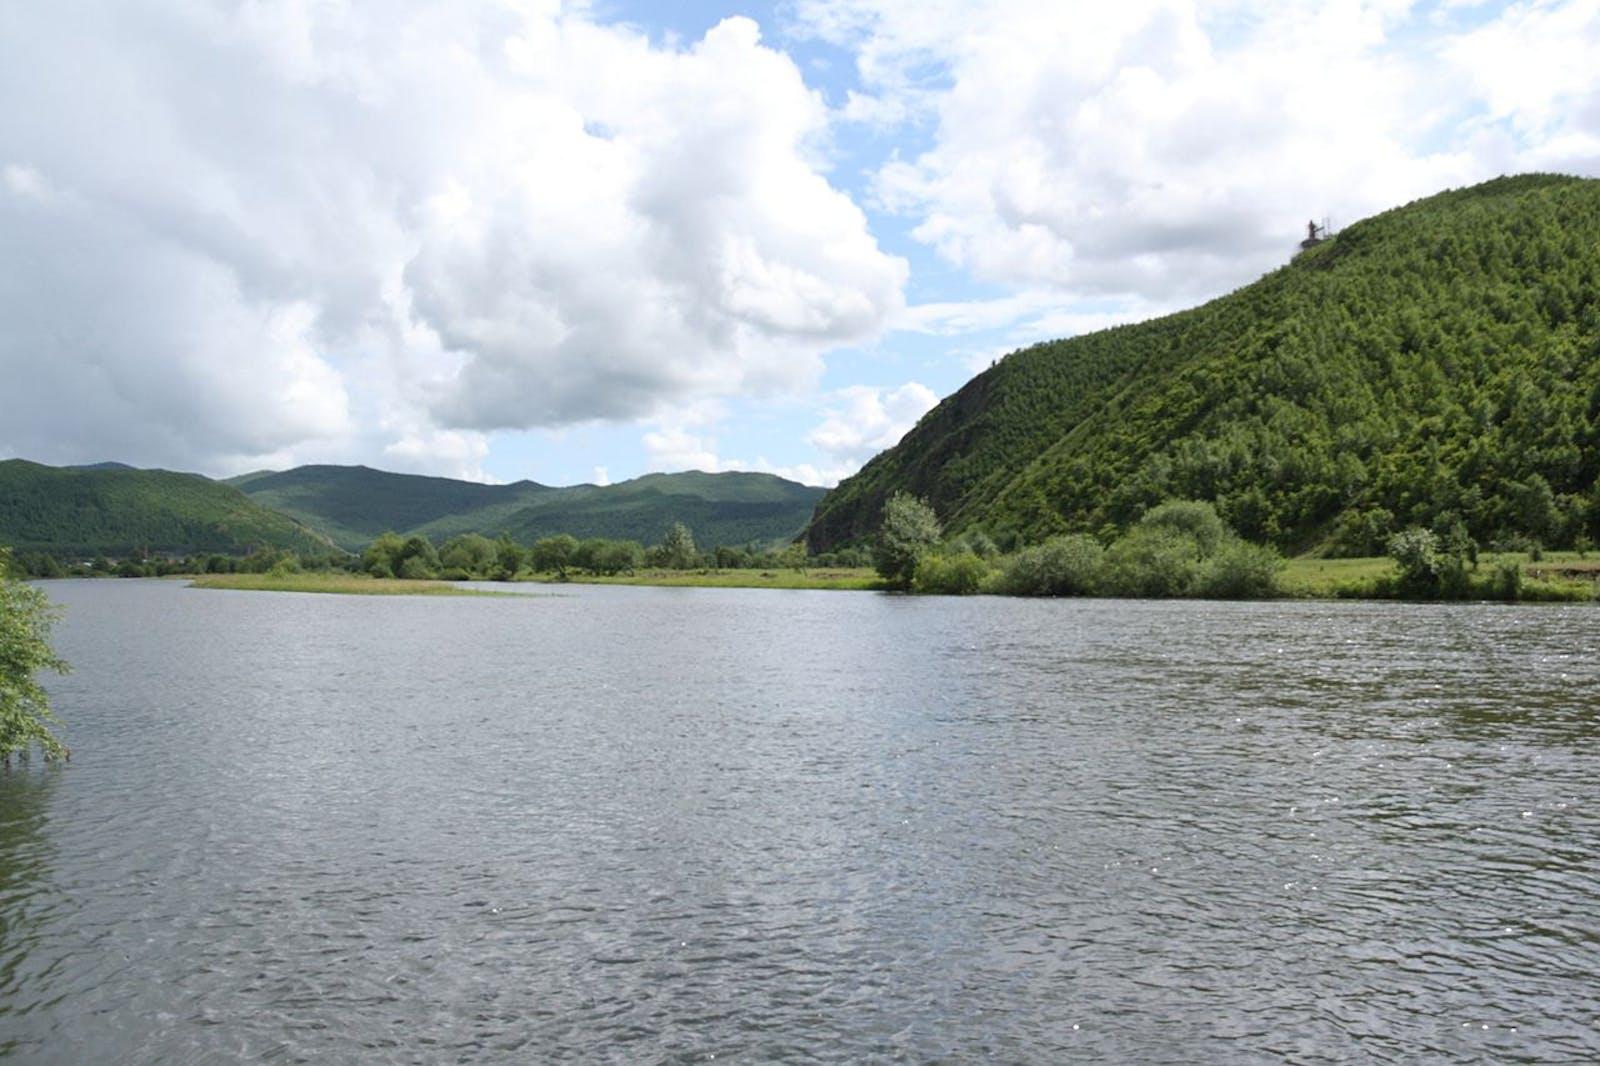 Da Hinggan-Dzhagdy Mountains Conifer Forests